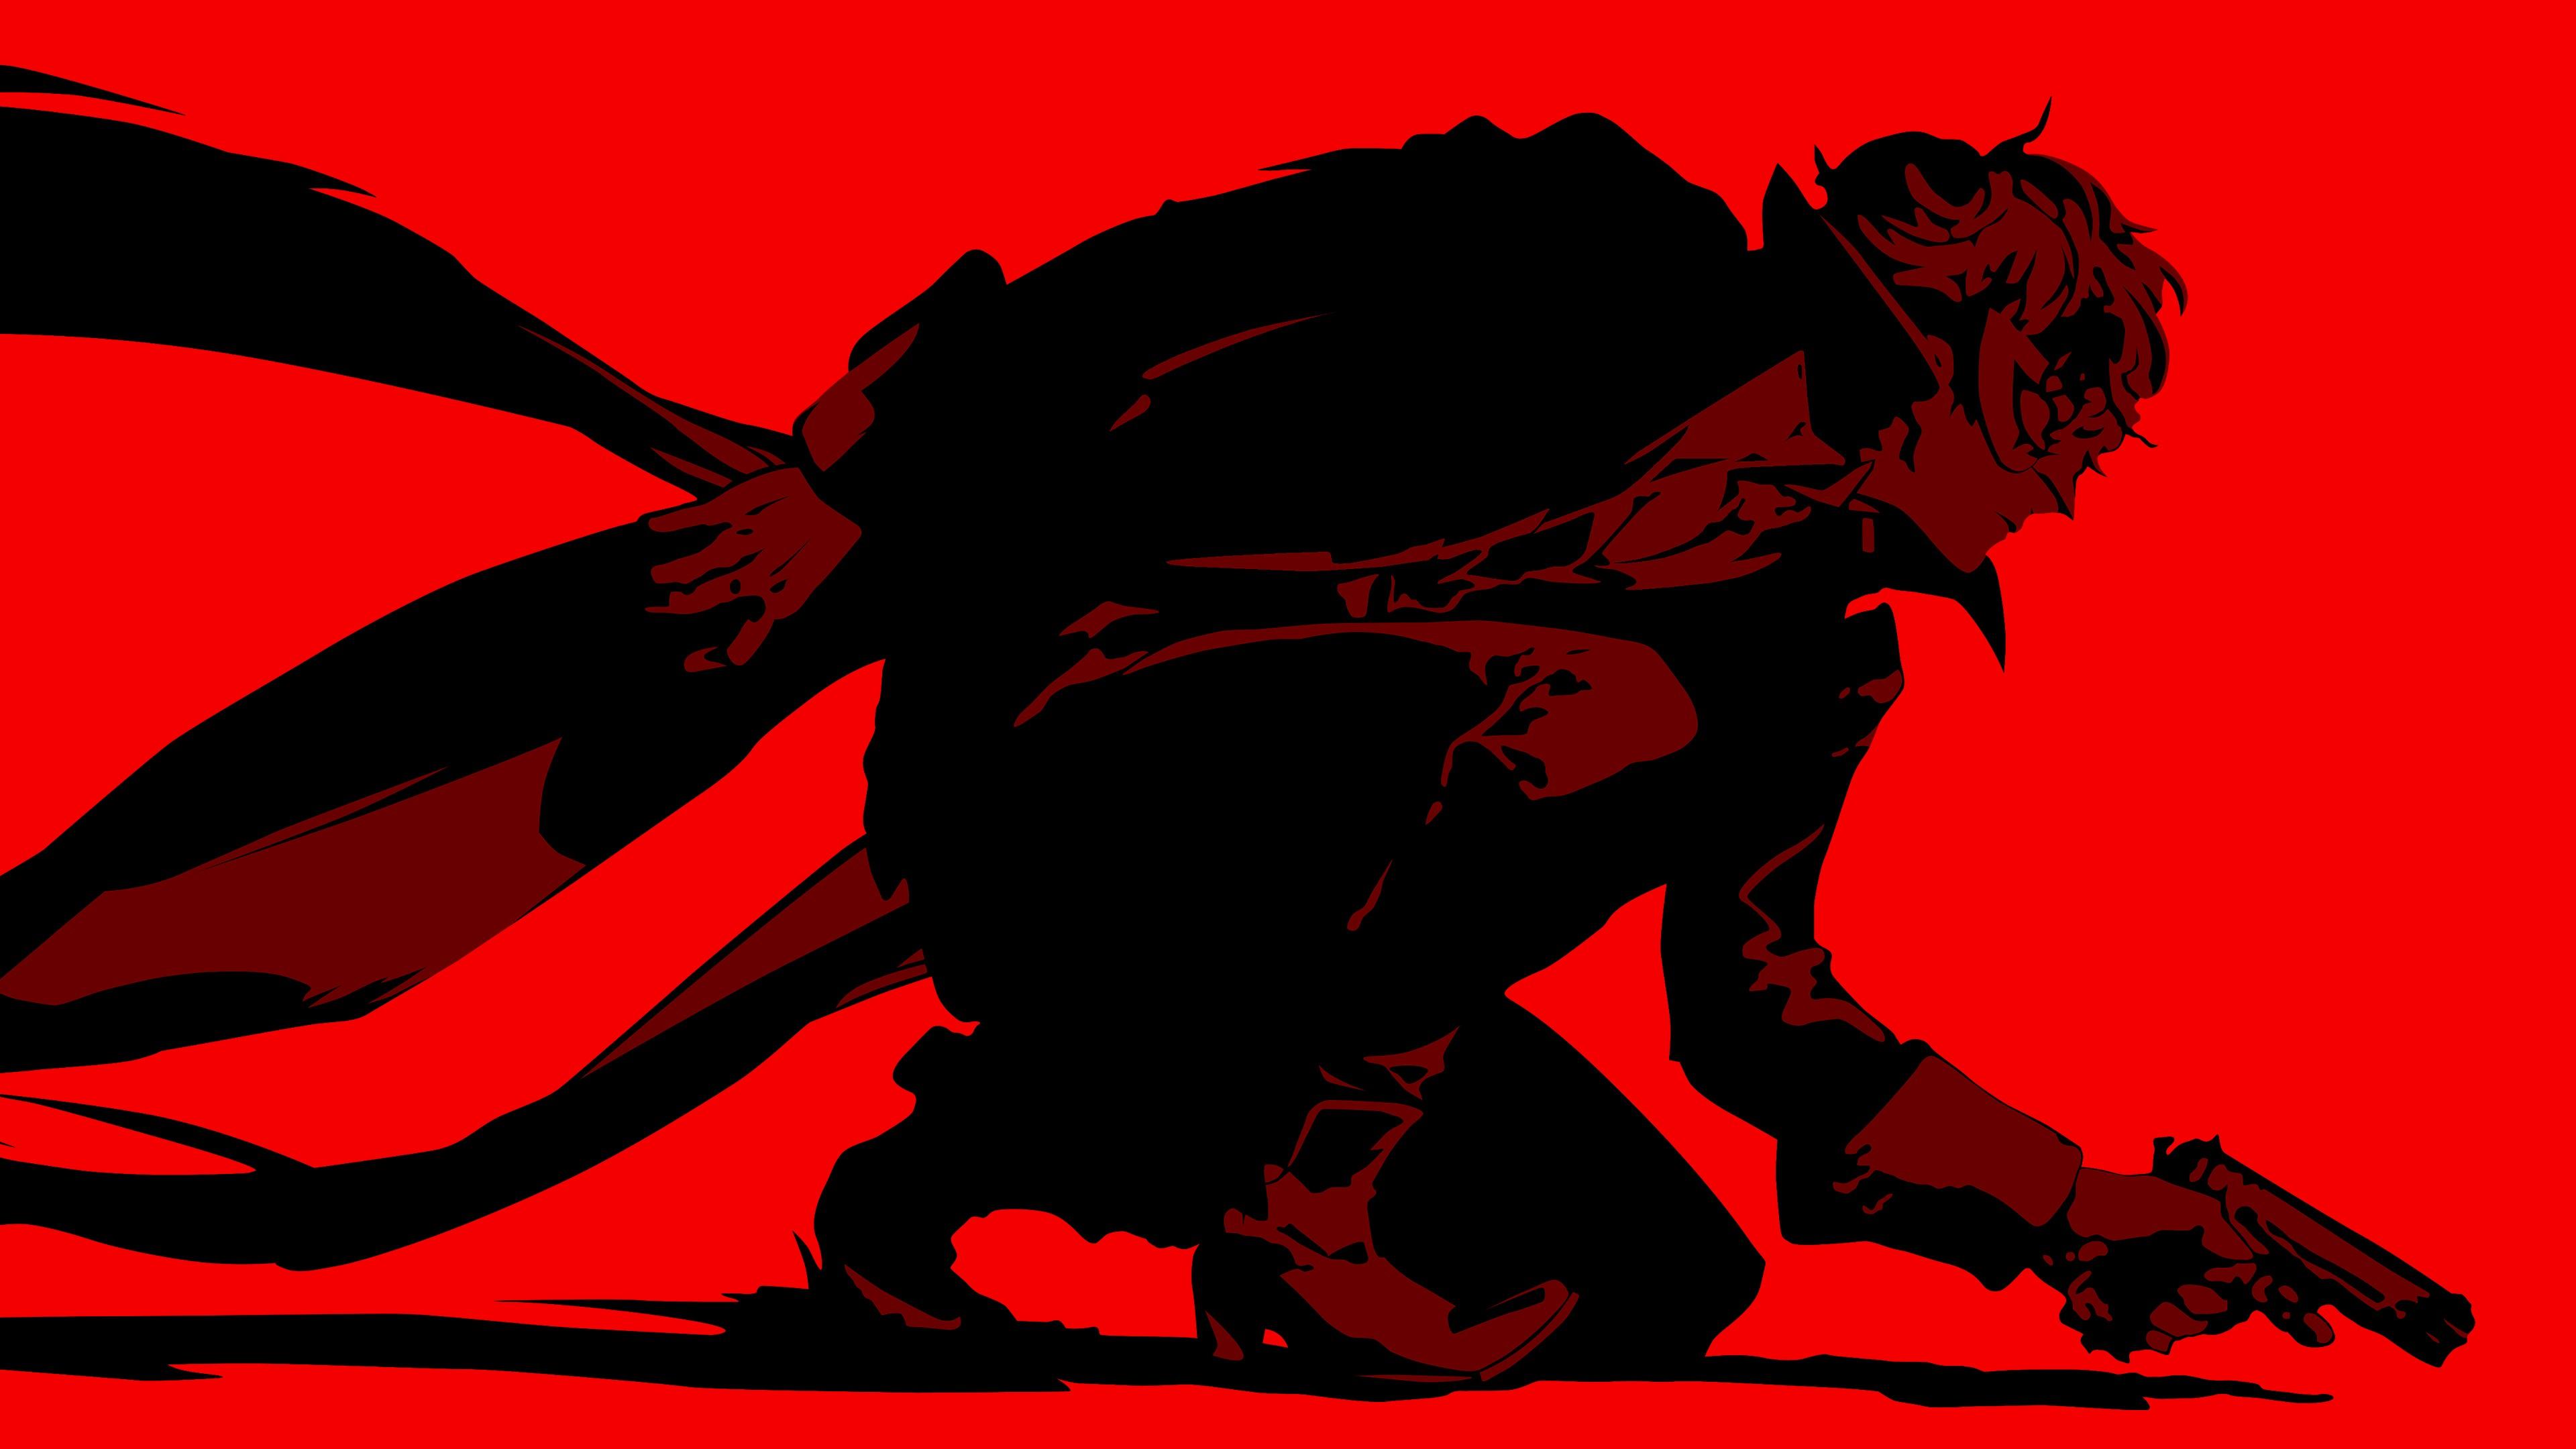 Wallpaper Illustration Video Games Silhouette Persona 5 Demon